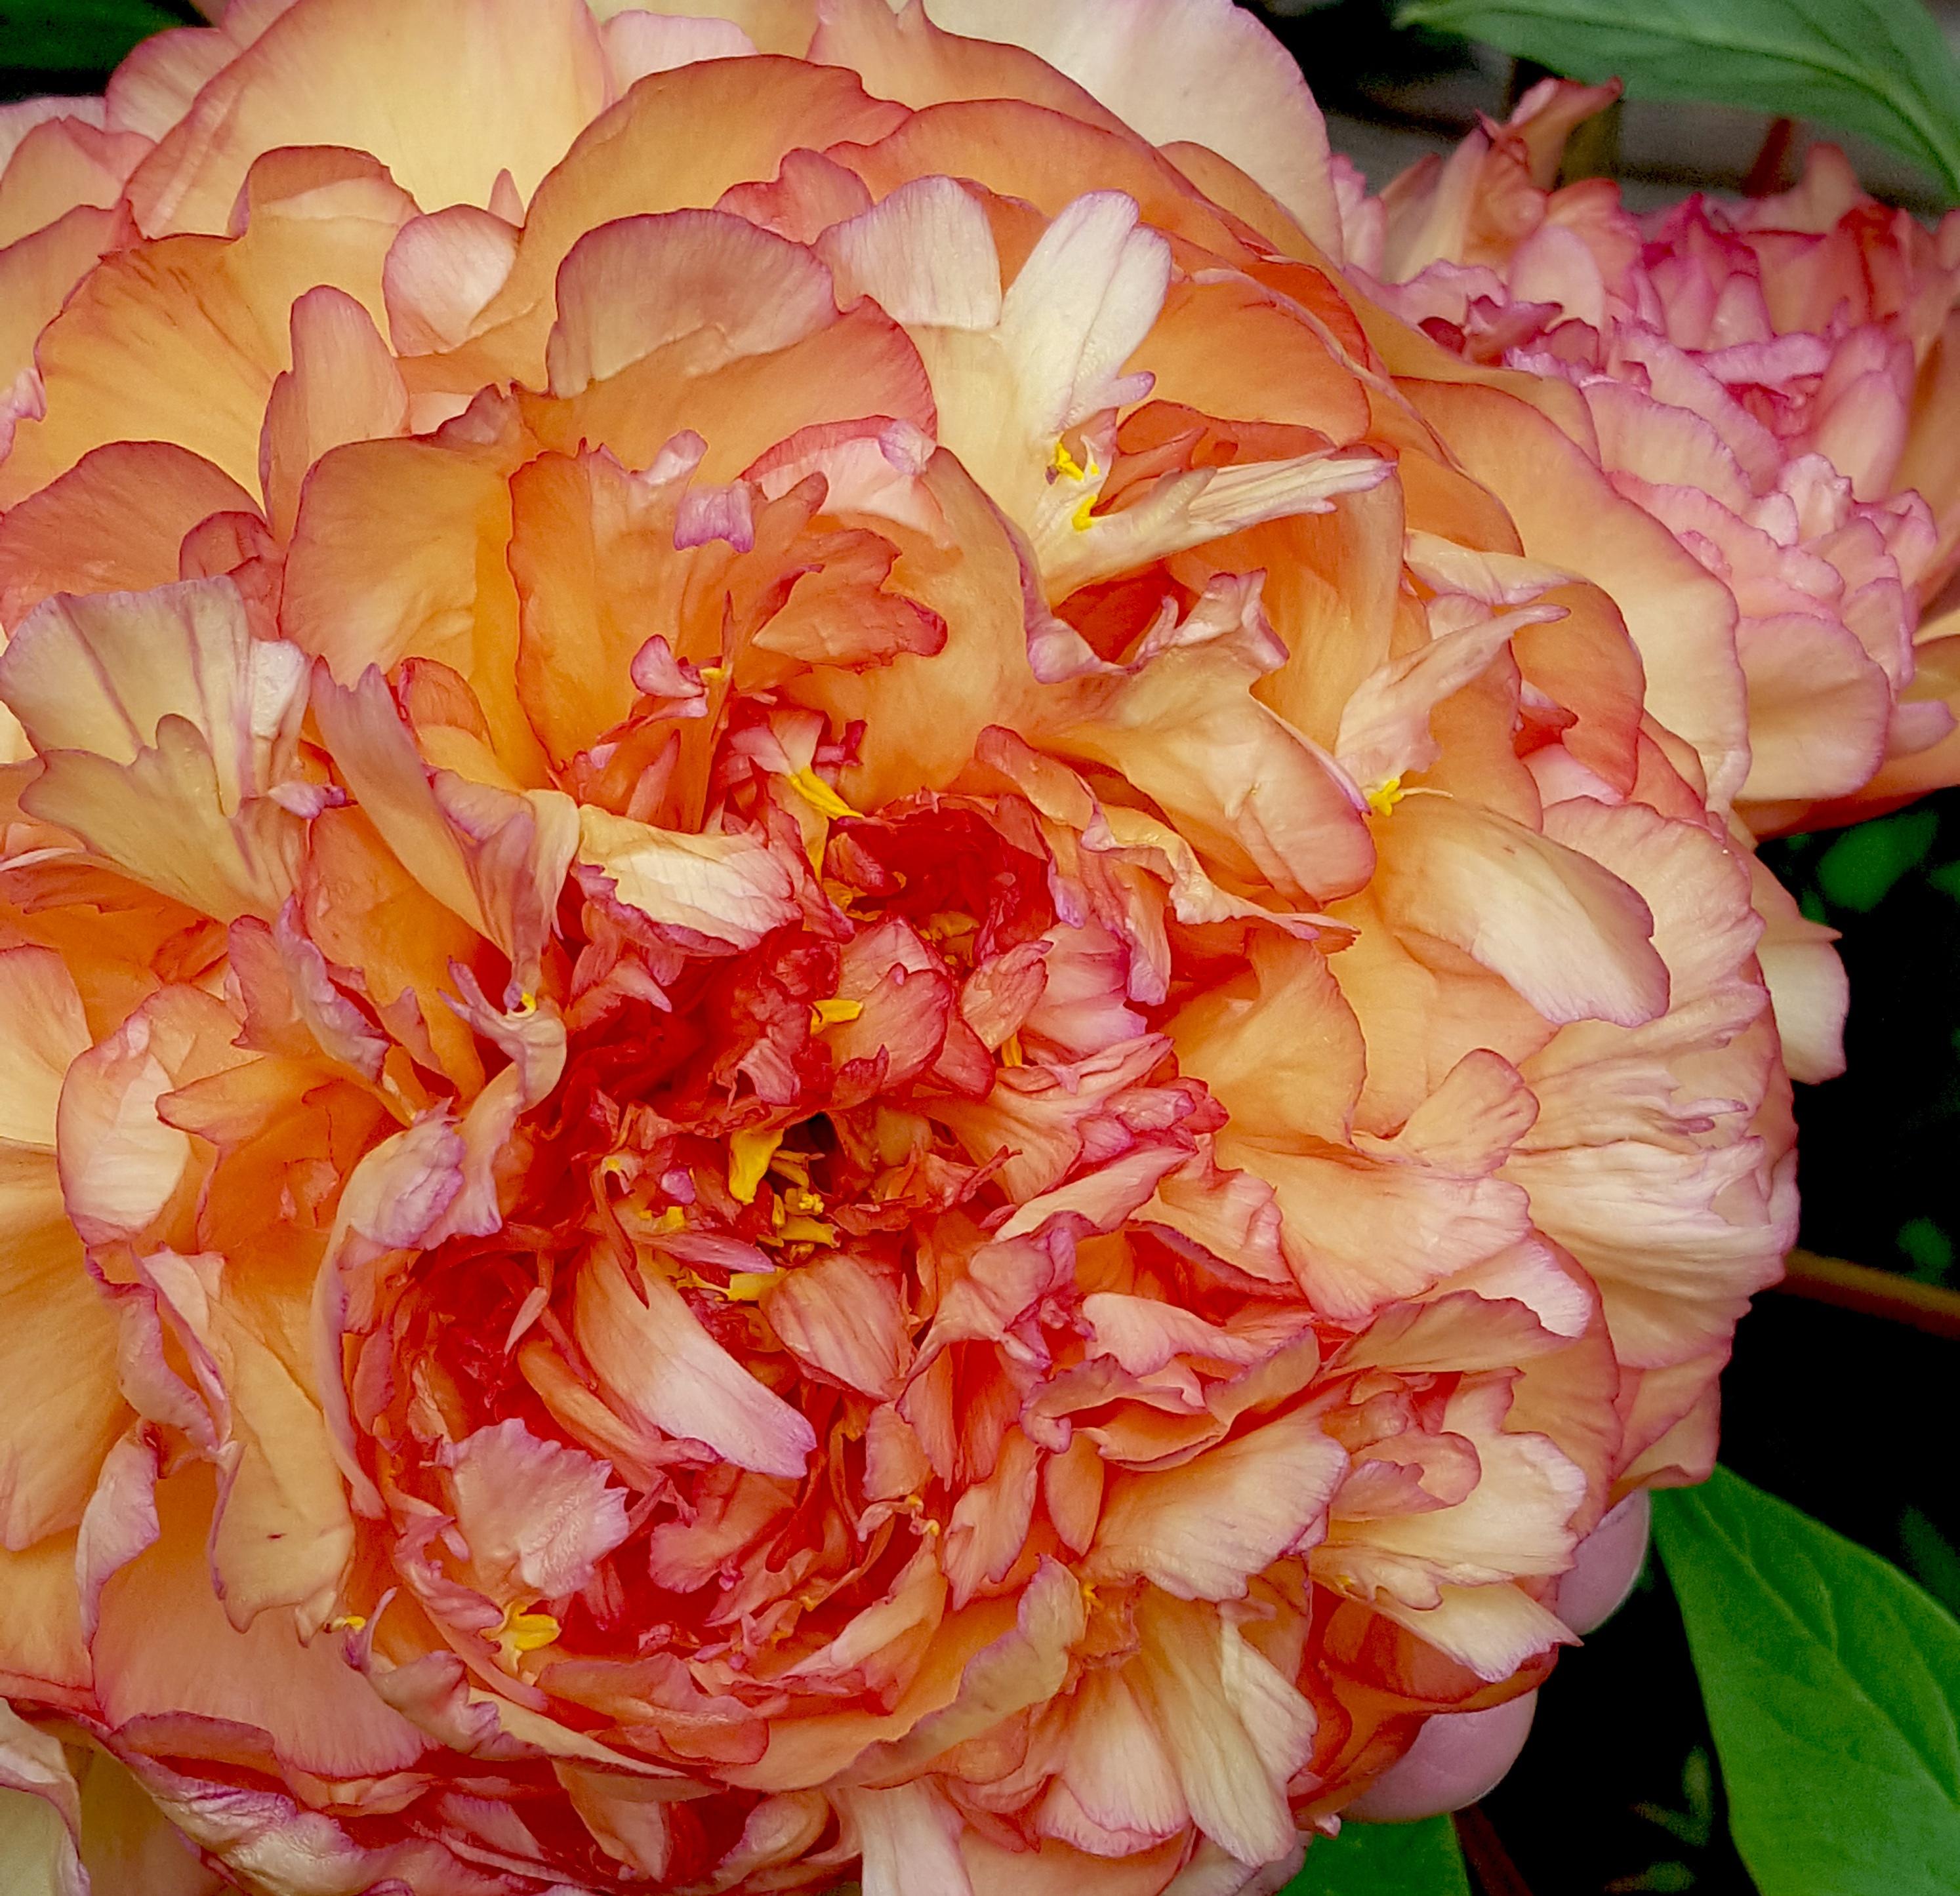 menanam bunga daun bunga mawar berwarna merah muda Budidaya Bunga peony floribunda tanaman berbunga mawar taman